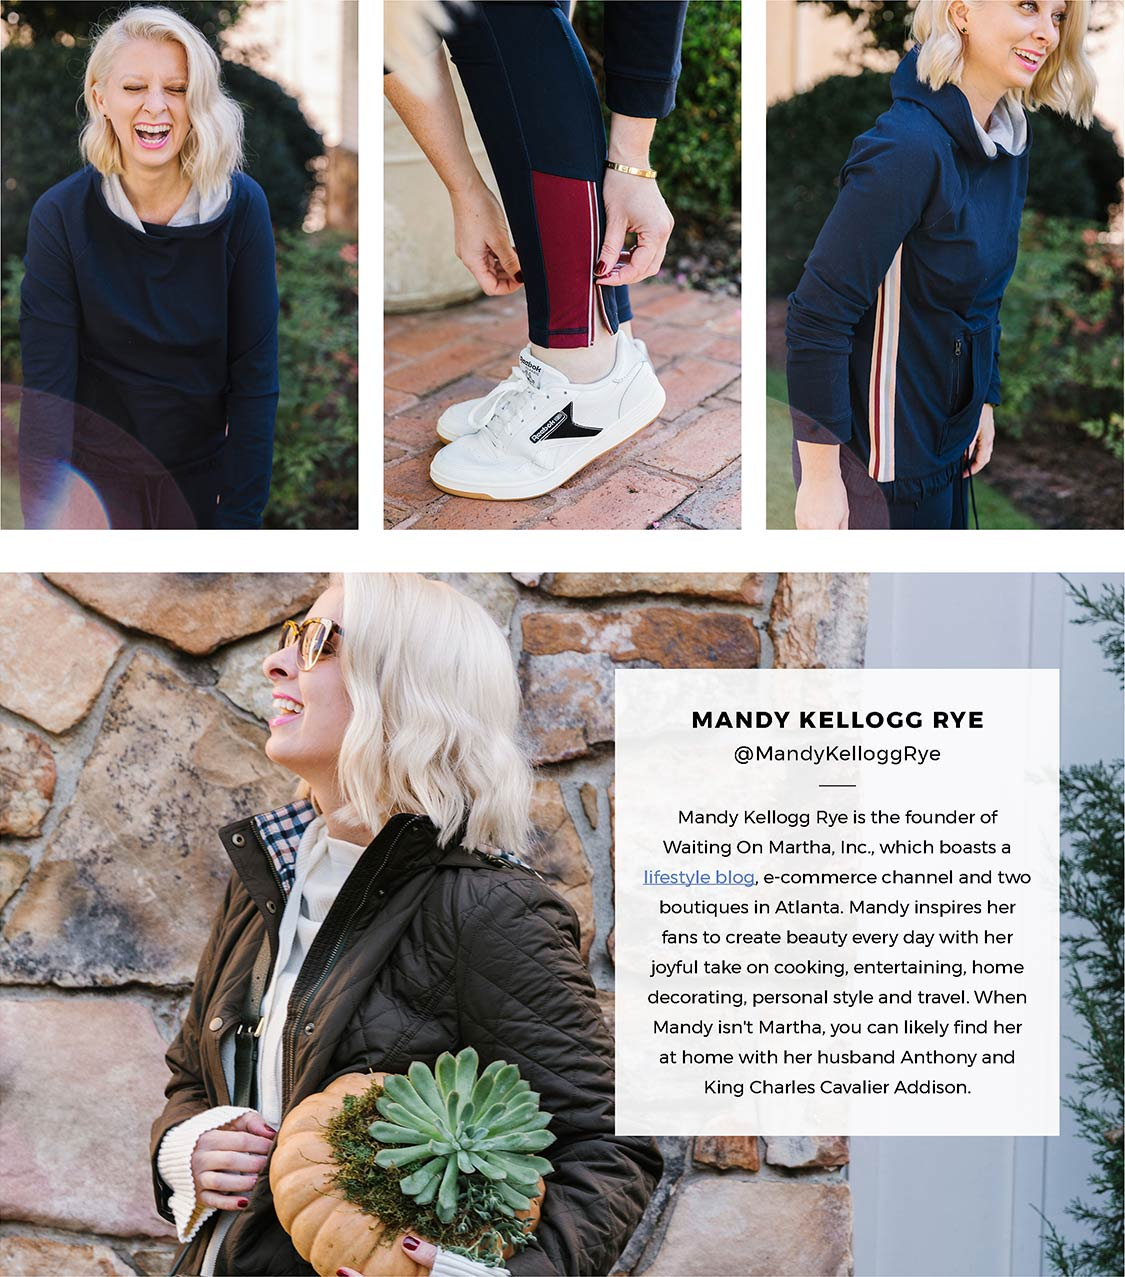 Get crafty with Mandy Kellogg Rye